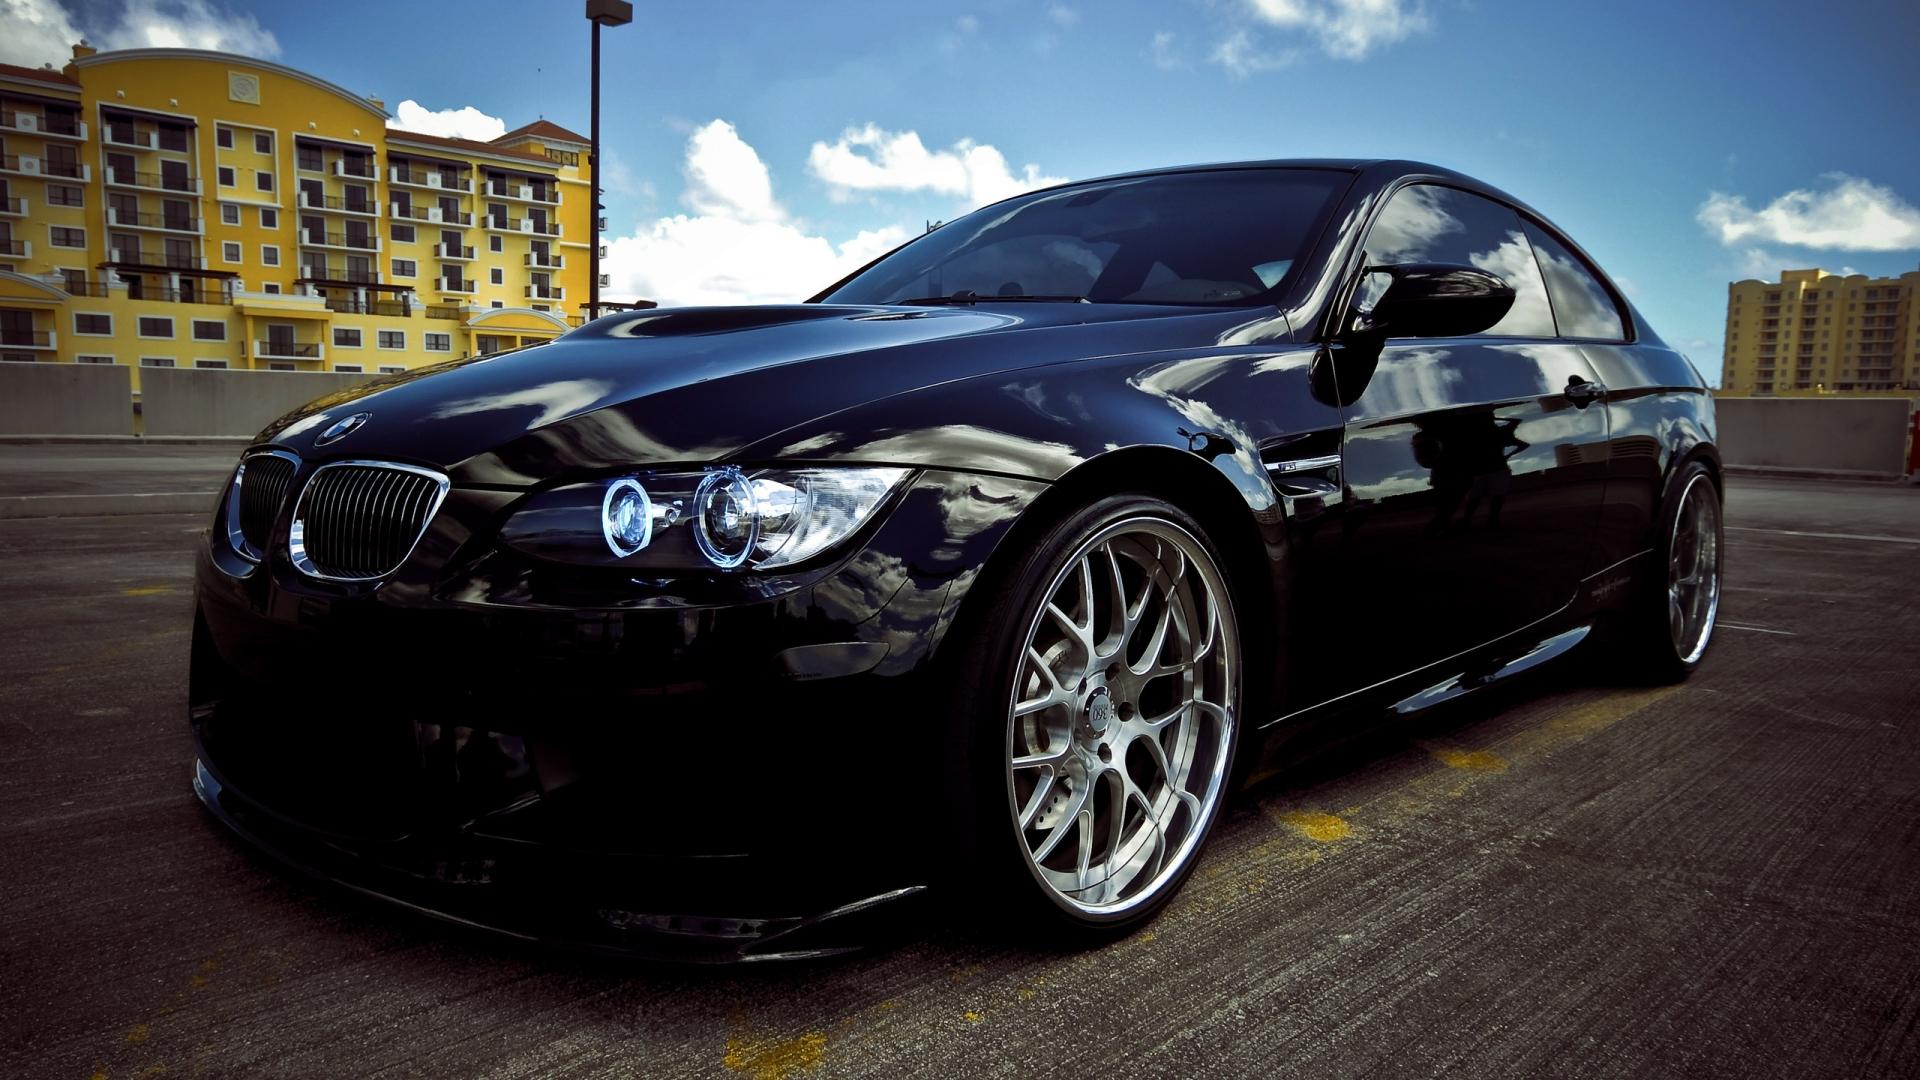 BMW HD Wallpapers 1920x1080 - WallpaperSafari